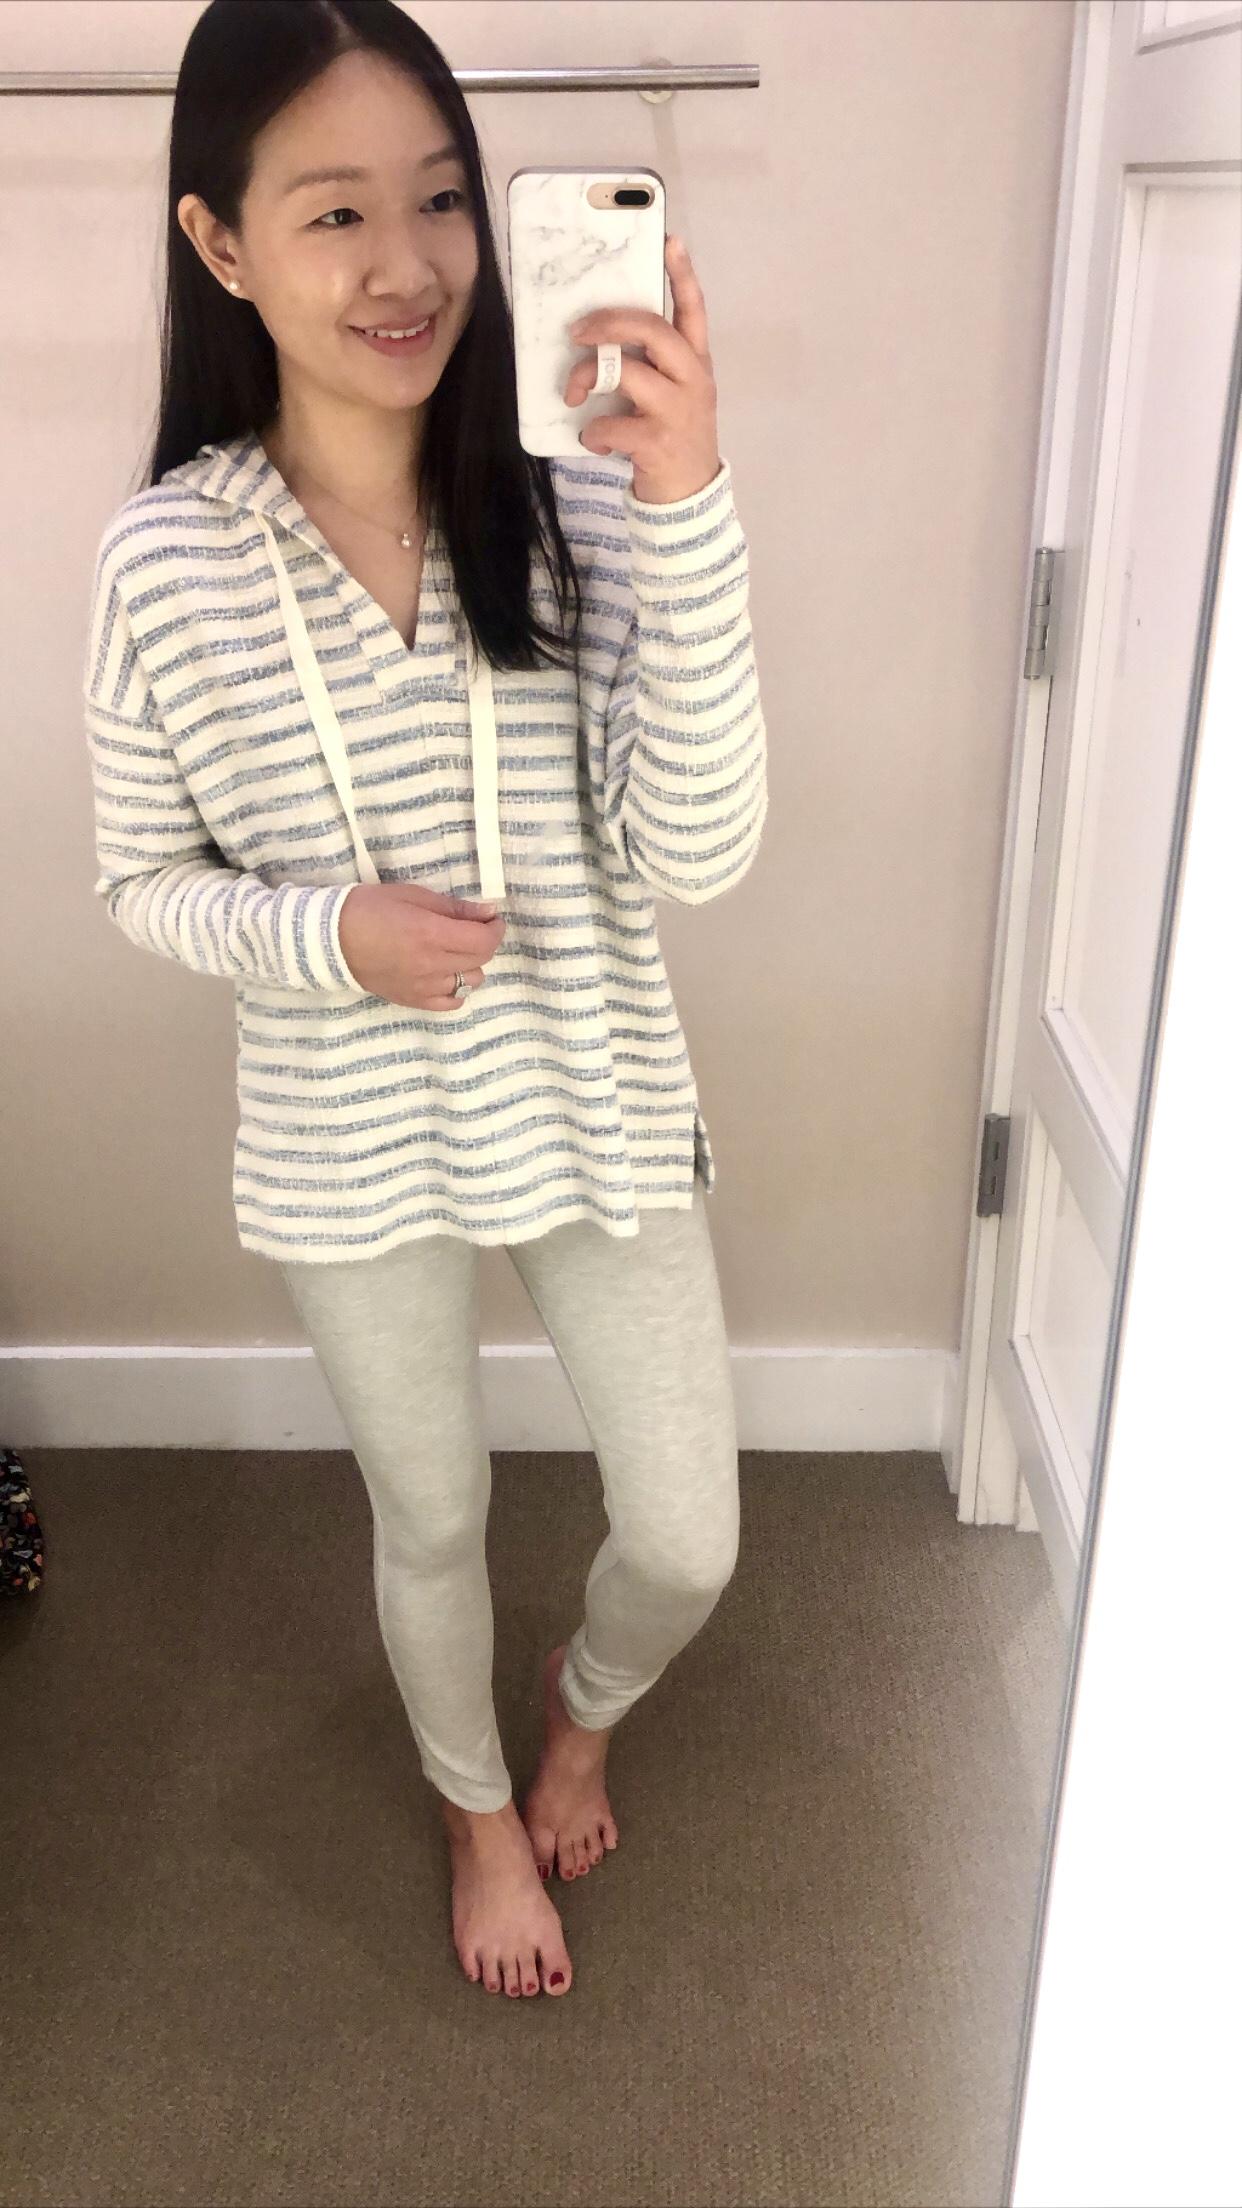 Lou & Grey Striped Boucle Hoodie, size XS regular